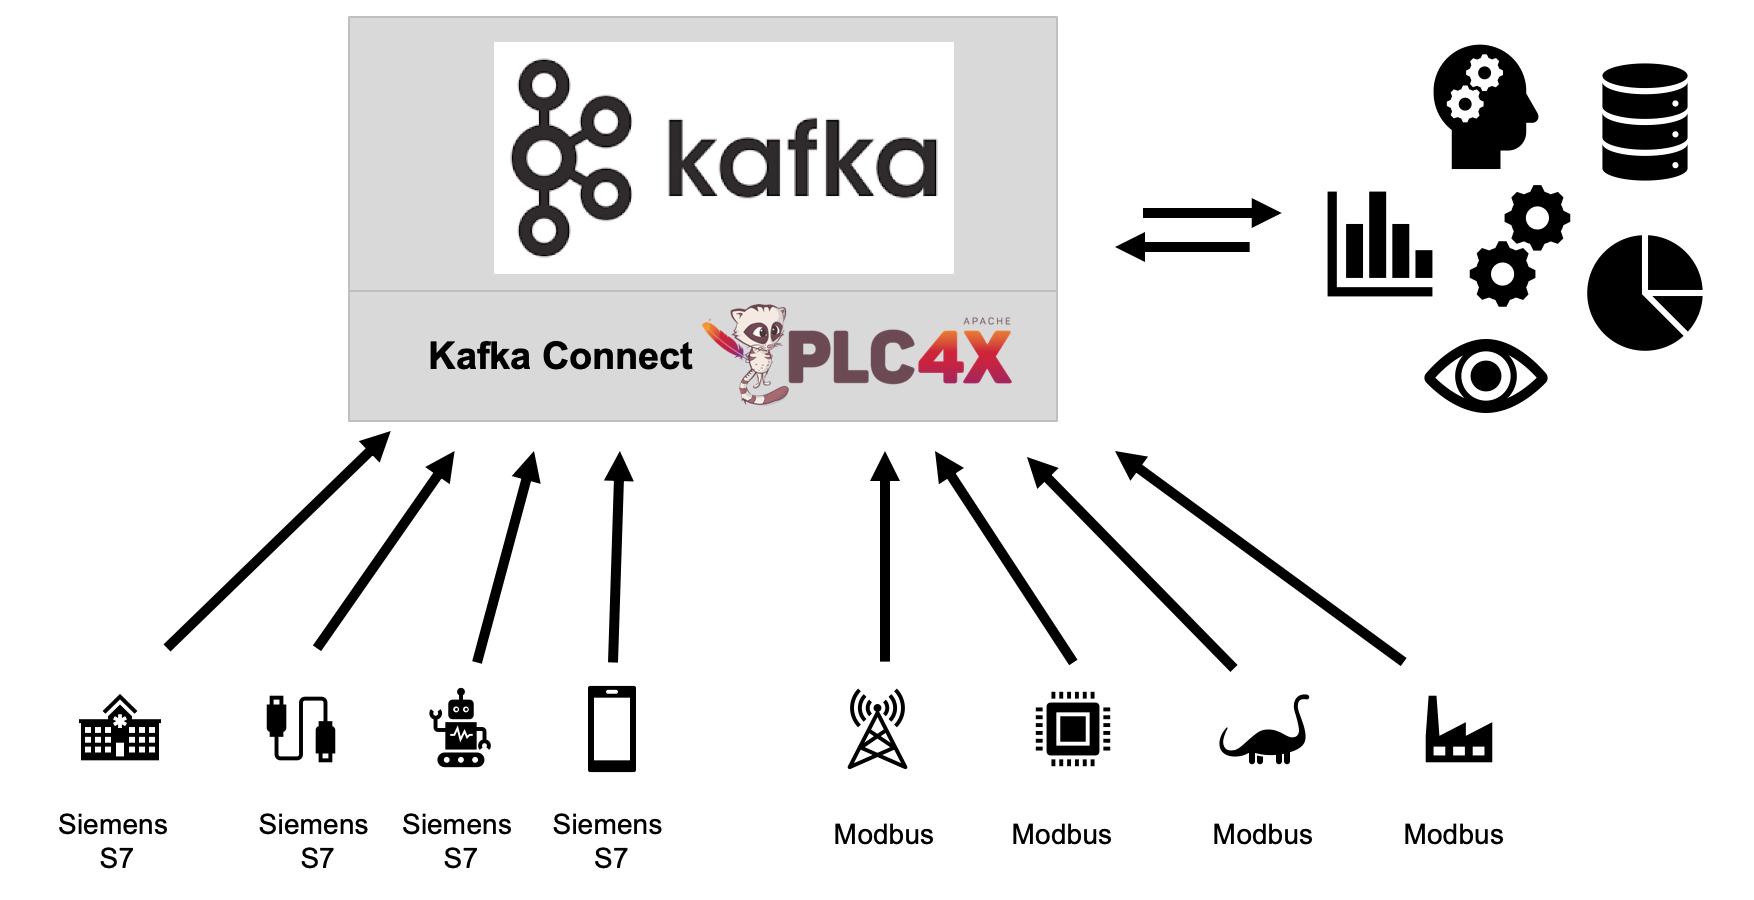 Modern IIoT Integration Architecture leveraging Apache Kafka, Kafka Connect and Apache PLC4X